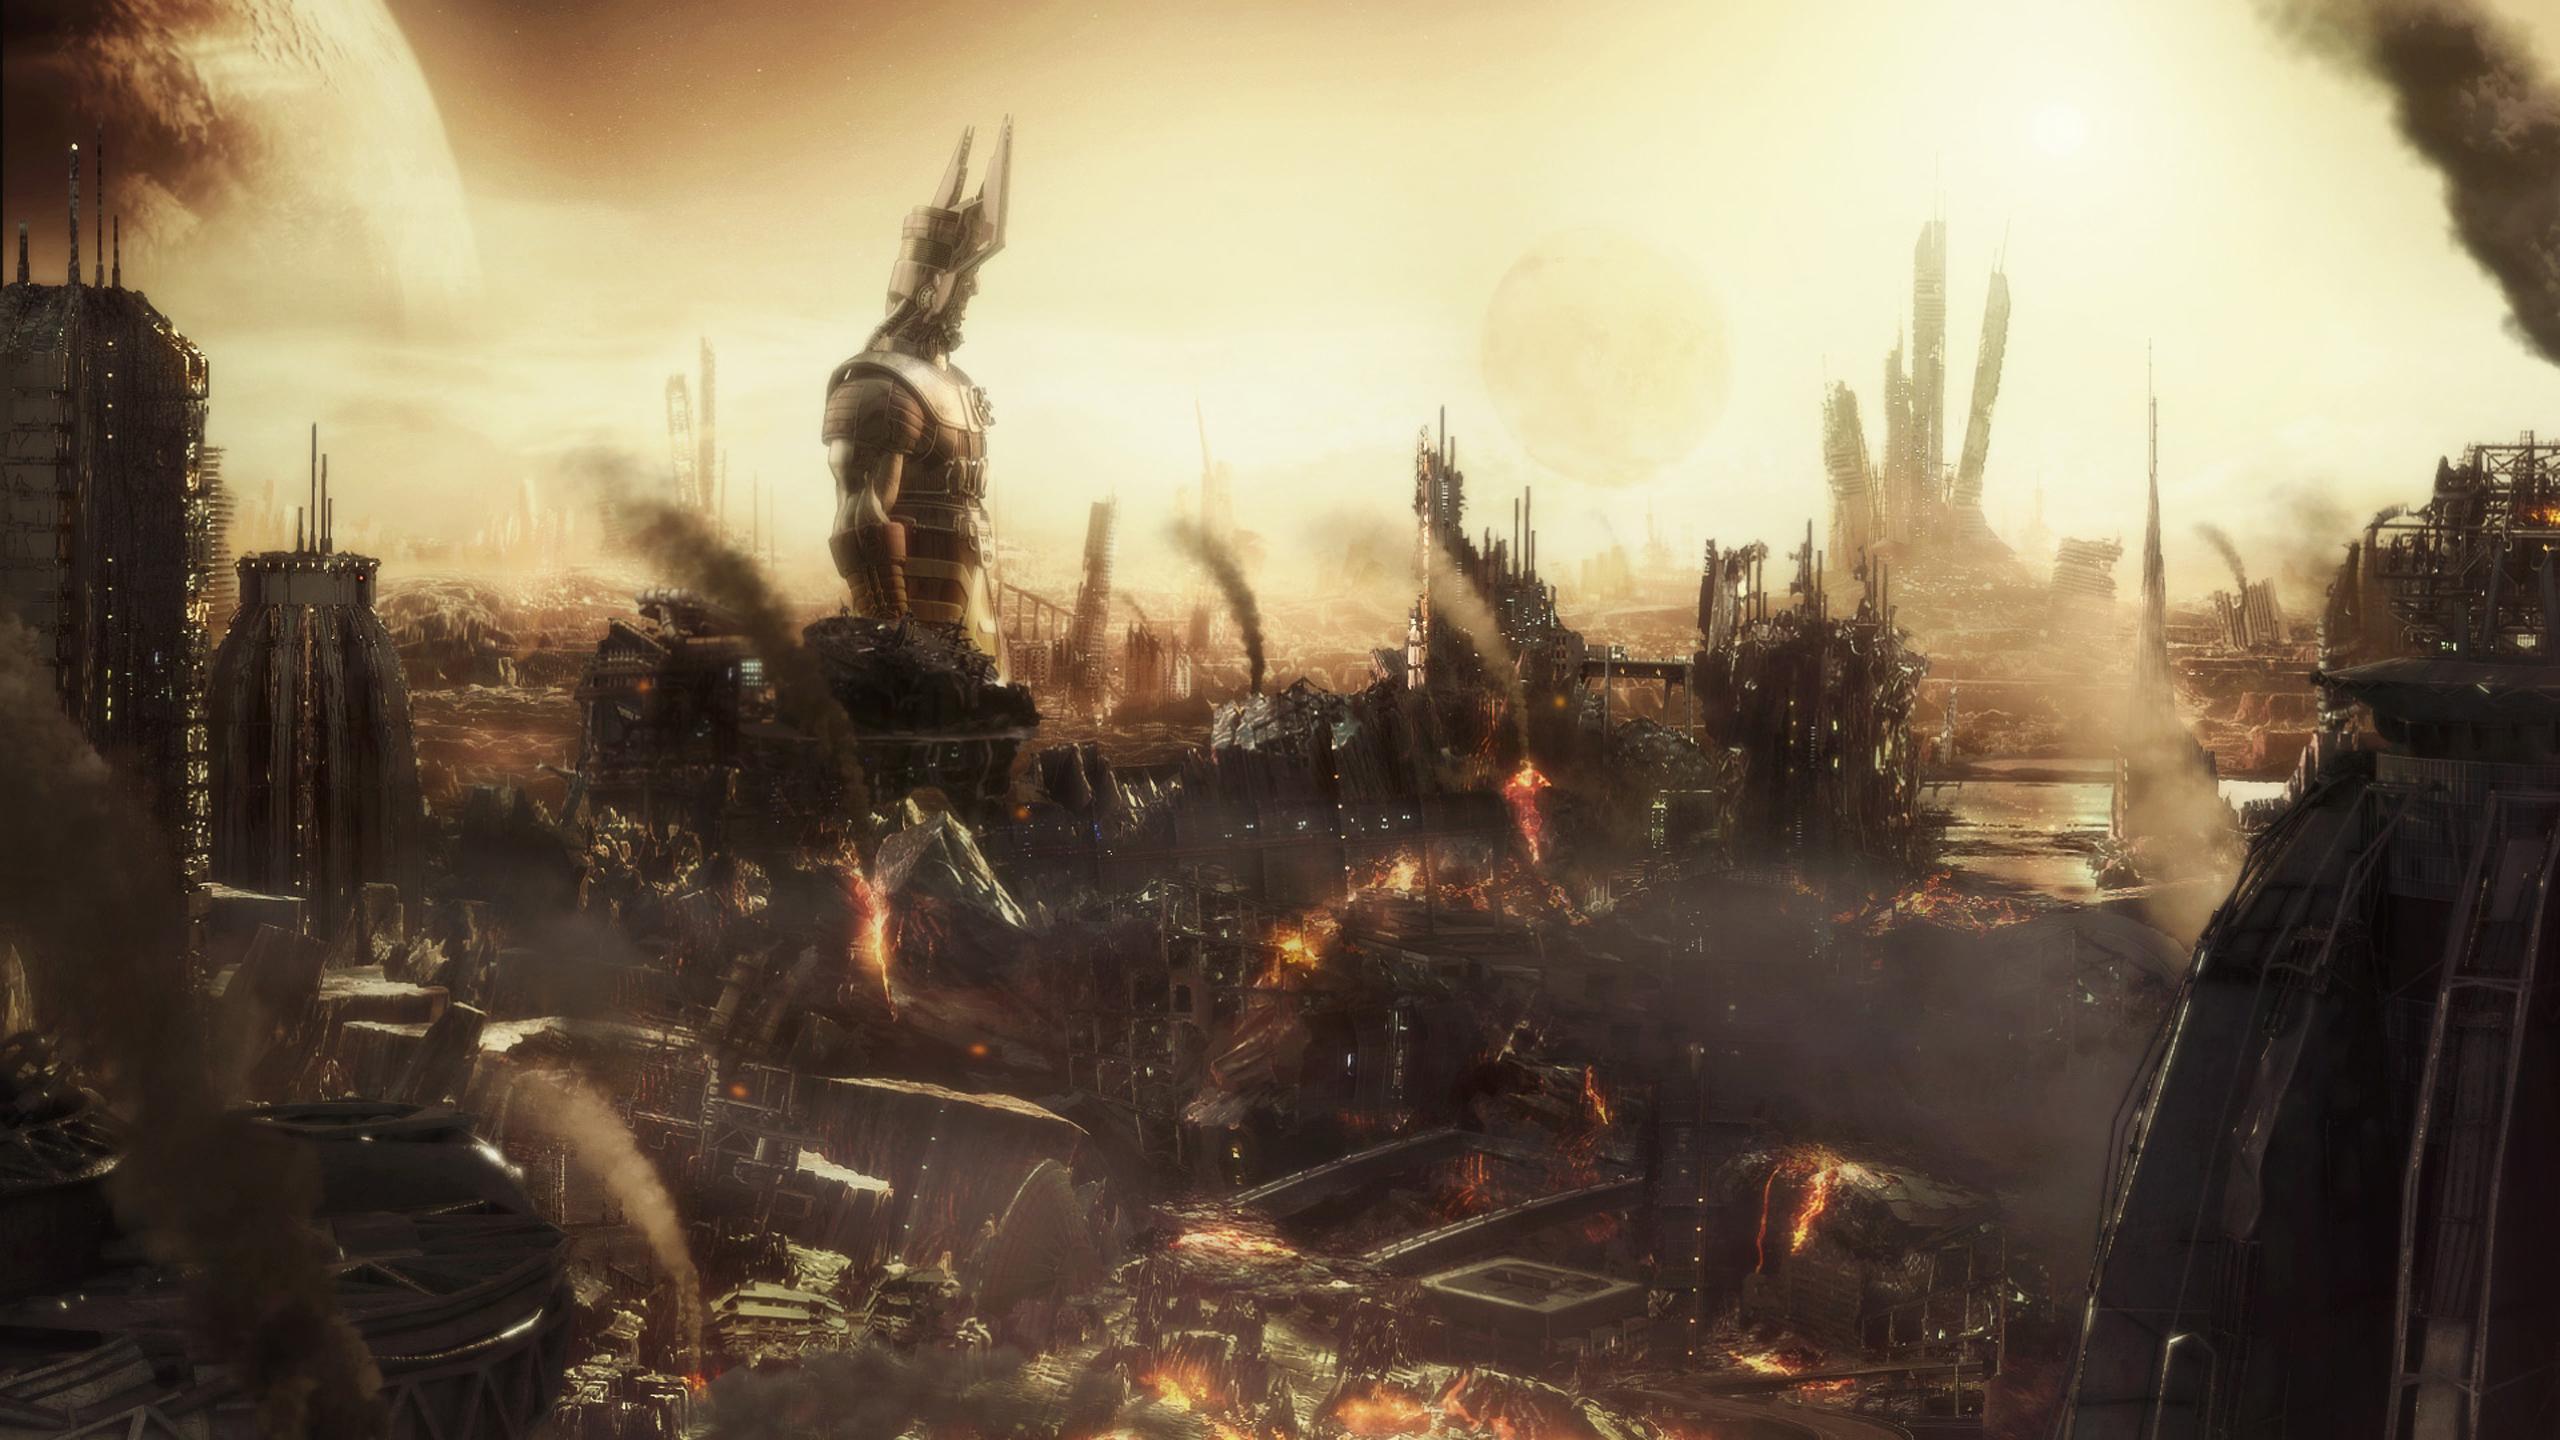 Sci Fi Post Apocalyptic Wallpaper Resolution 2560x1440 Id 1010567 Wallha Com